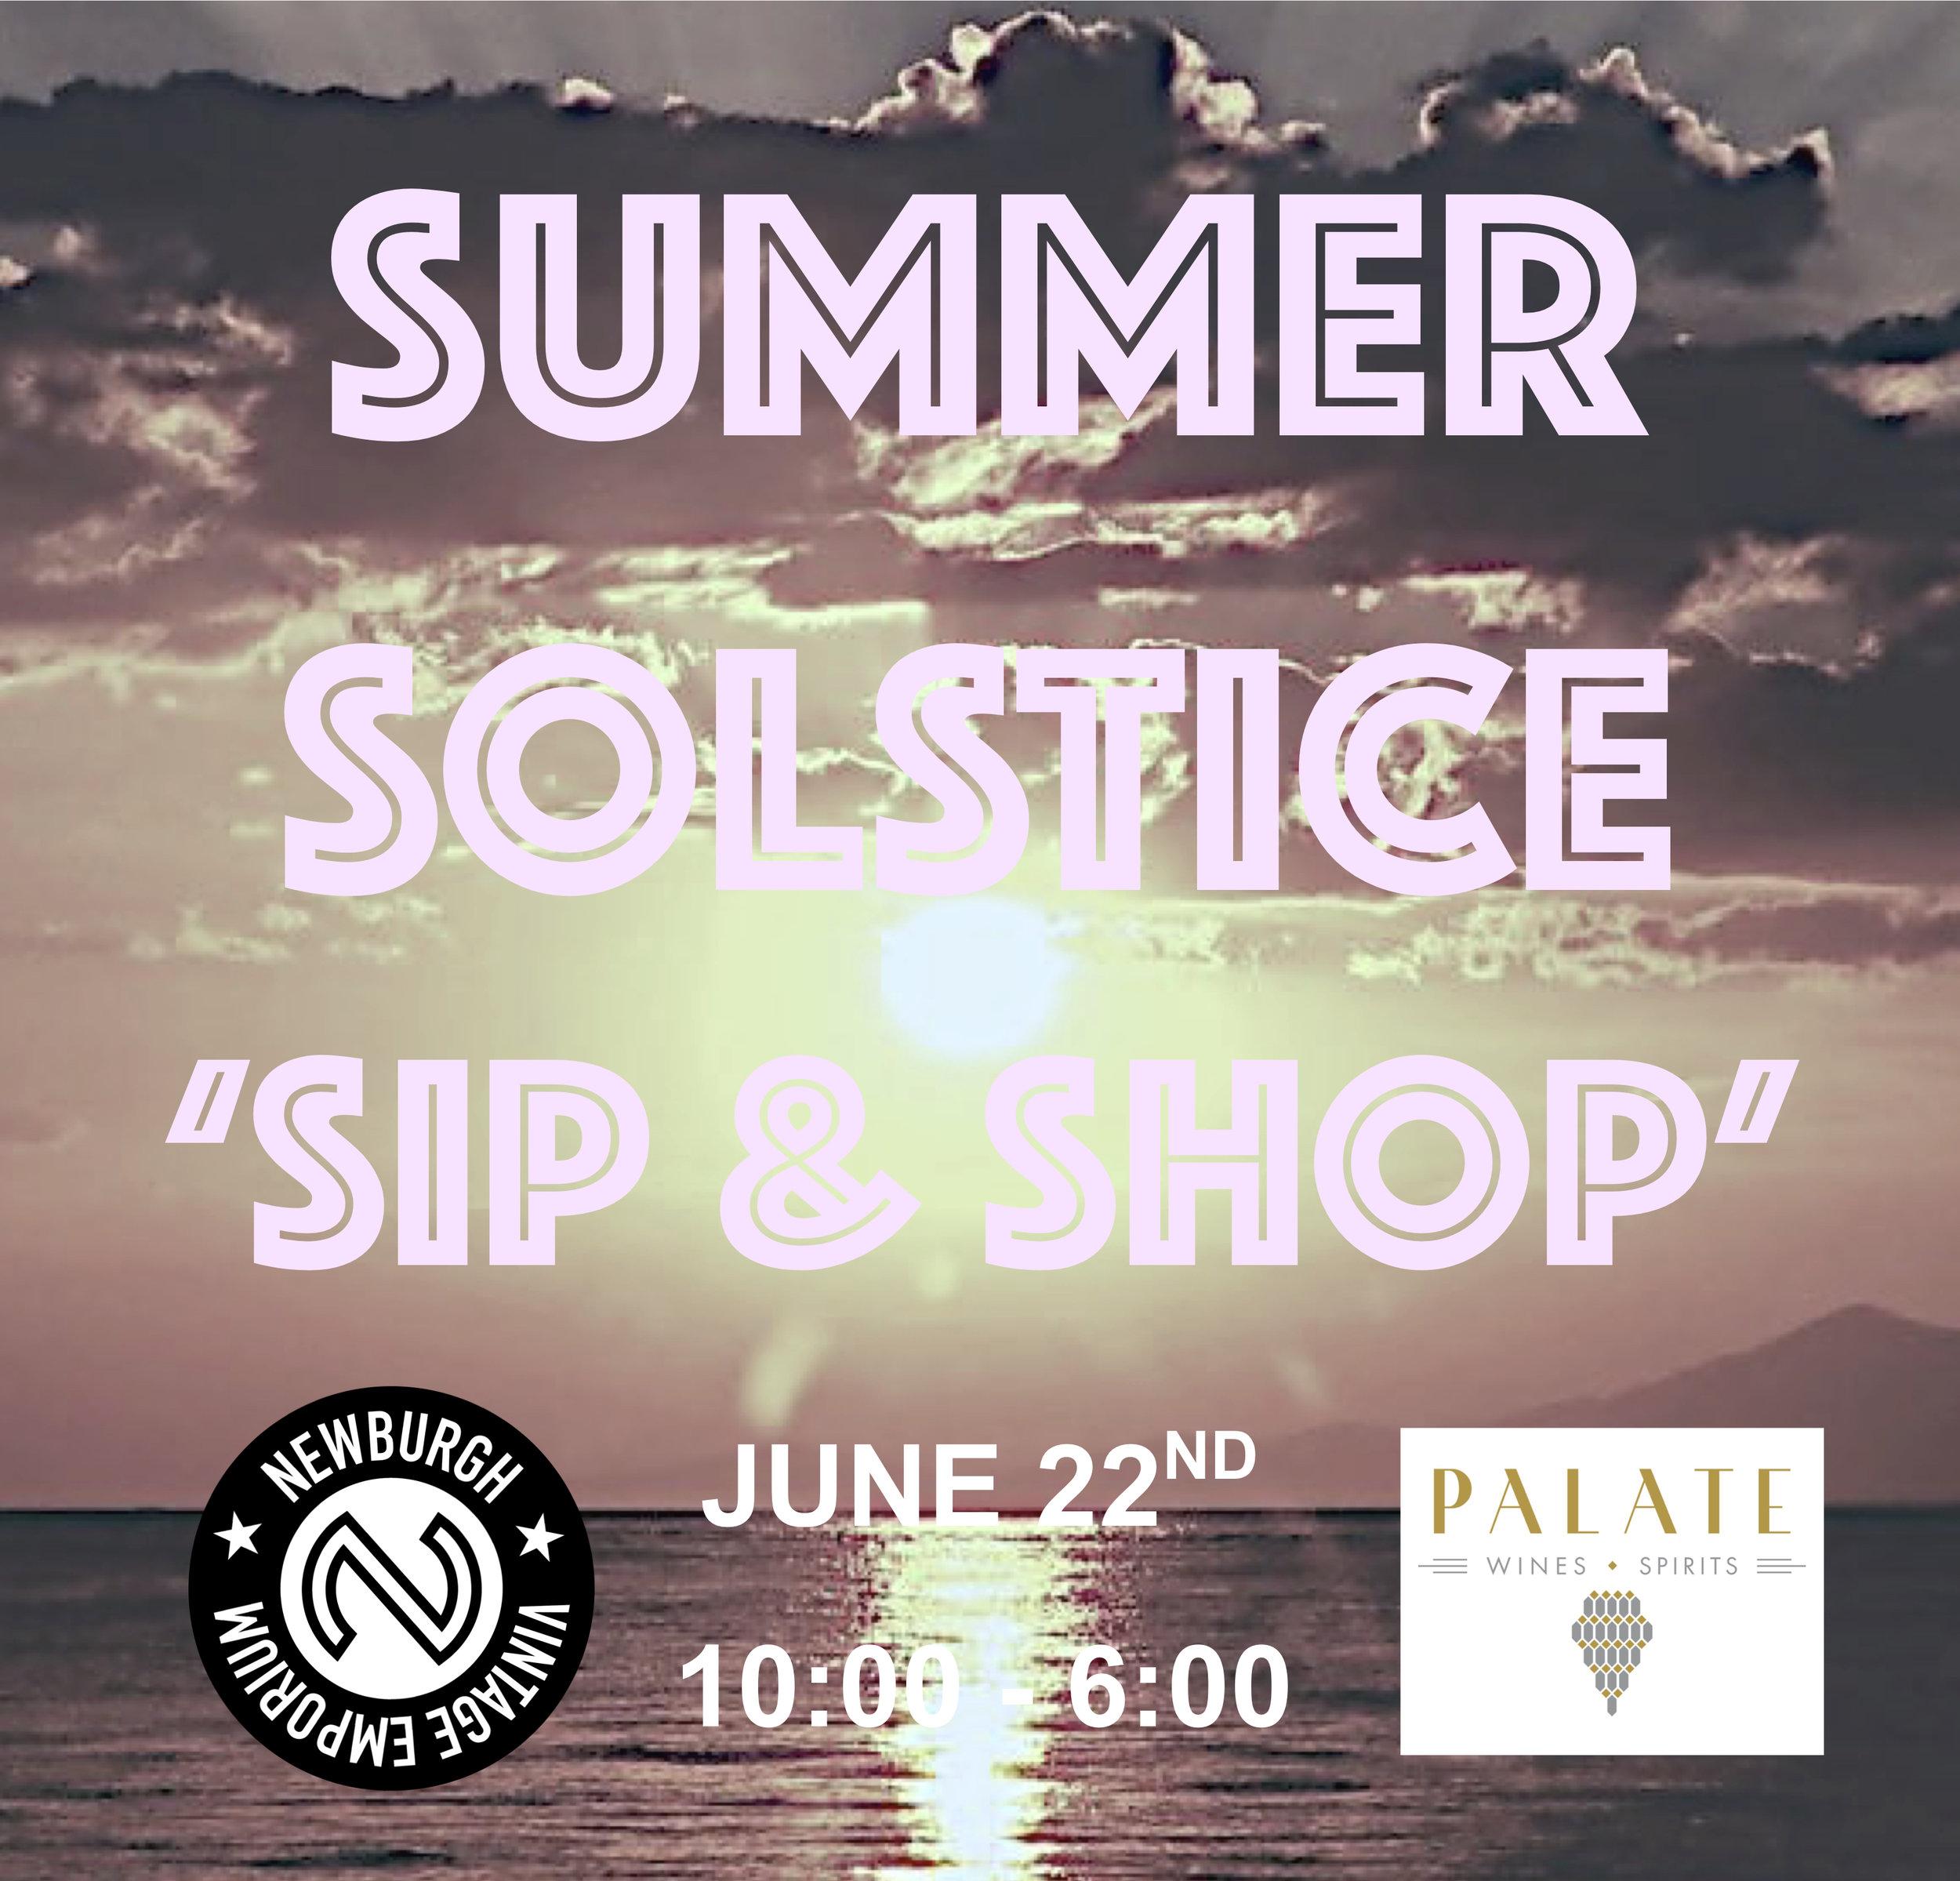 Summer Solstice Sip & Shop - Final IG.jpg